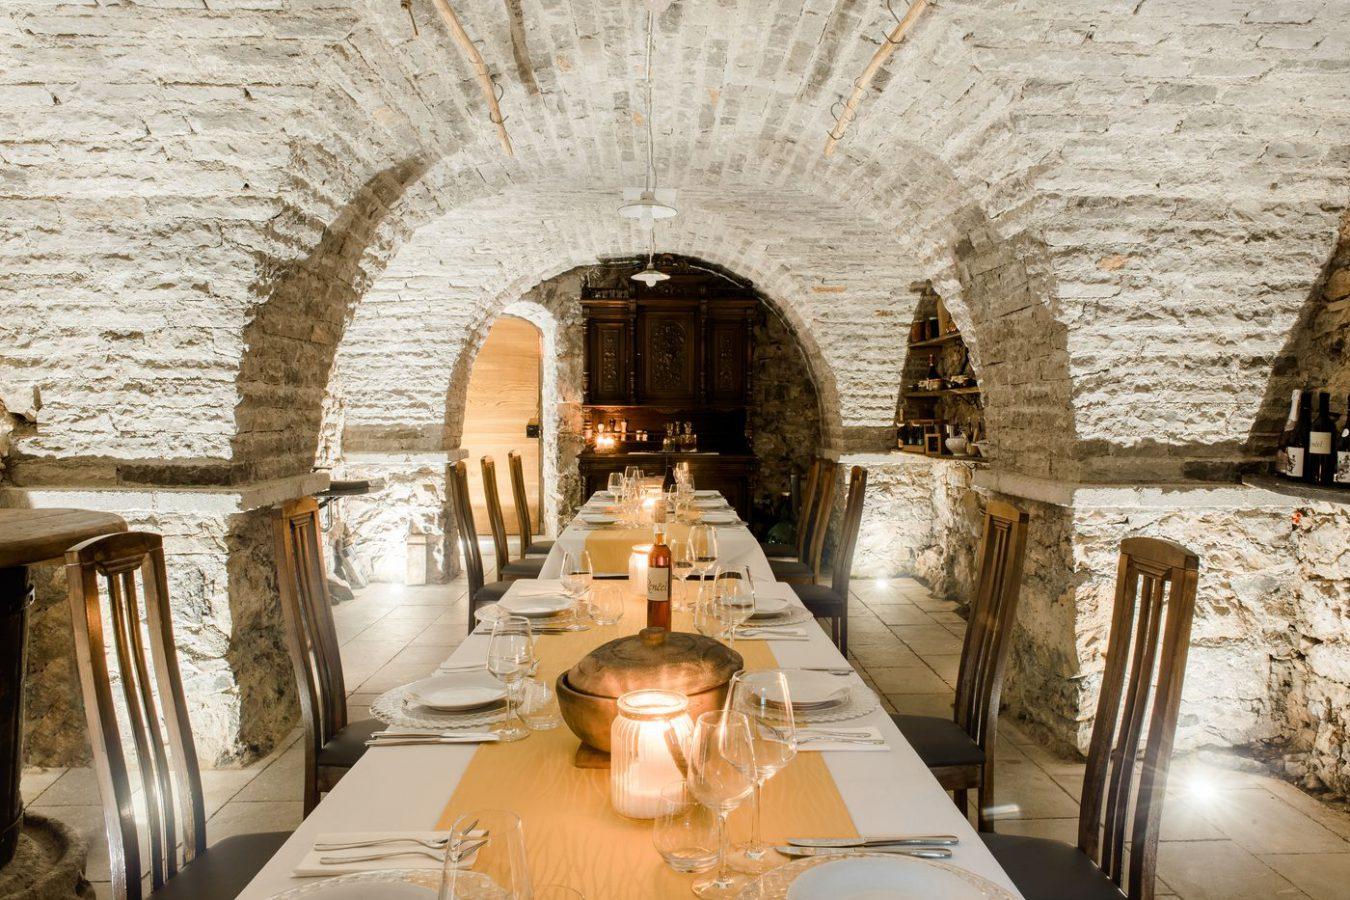 Wine Cellar Private Dining Asa Residence Private Villa Kras Slovenia